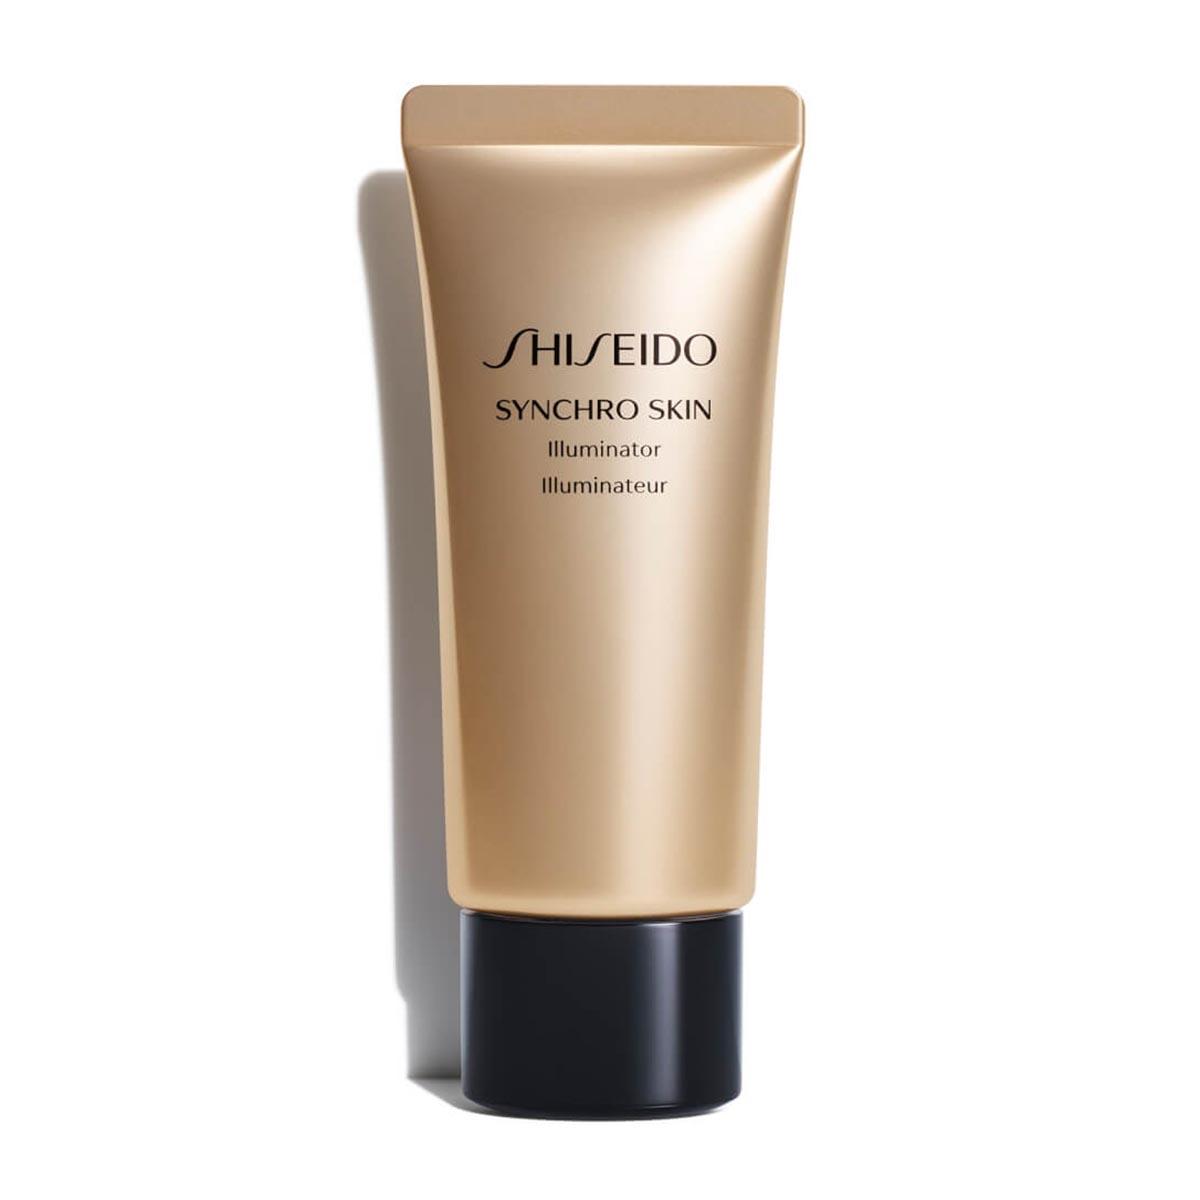 Shiseido syncro skin illuminator pure gold 40ml